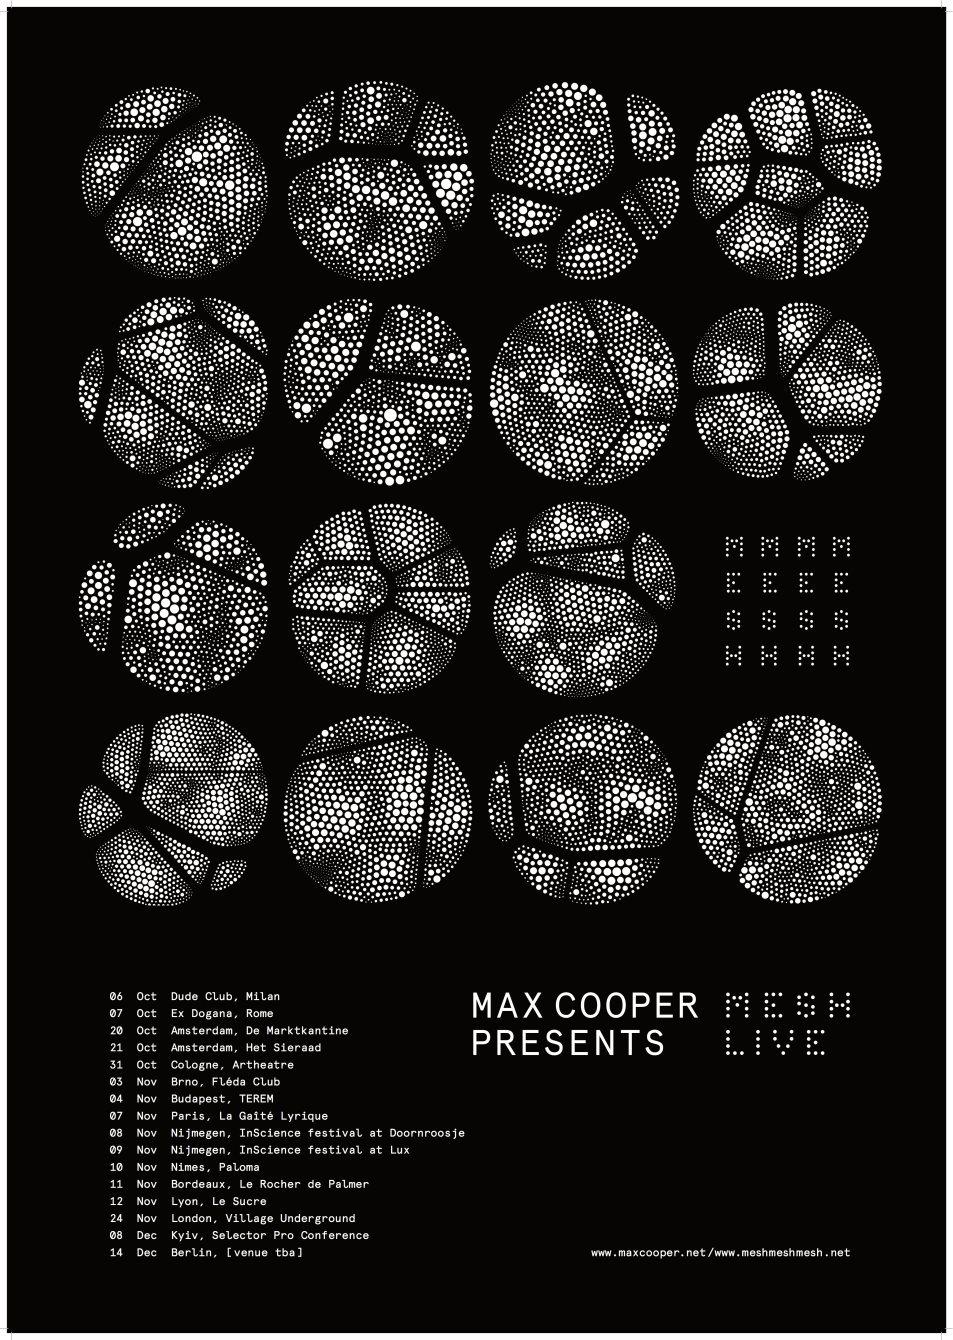 Max Cooper - MESH Live - Flyer front